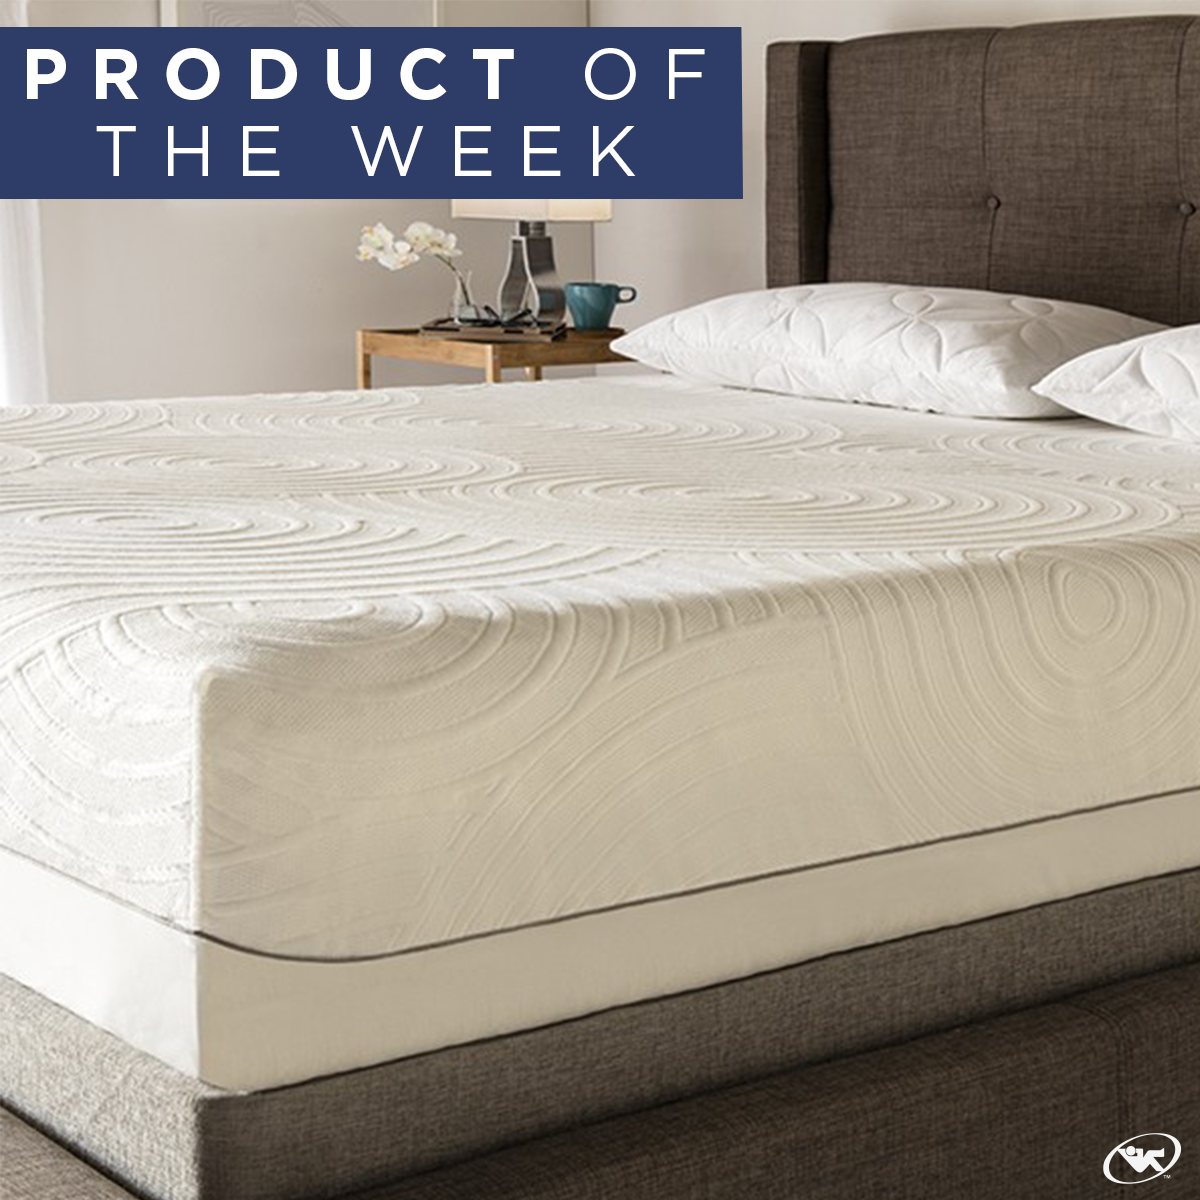 tempur protect mattress protector mattress